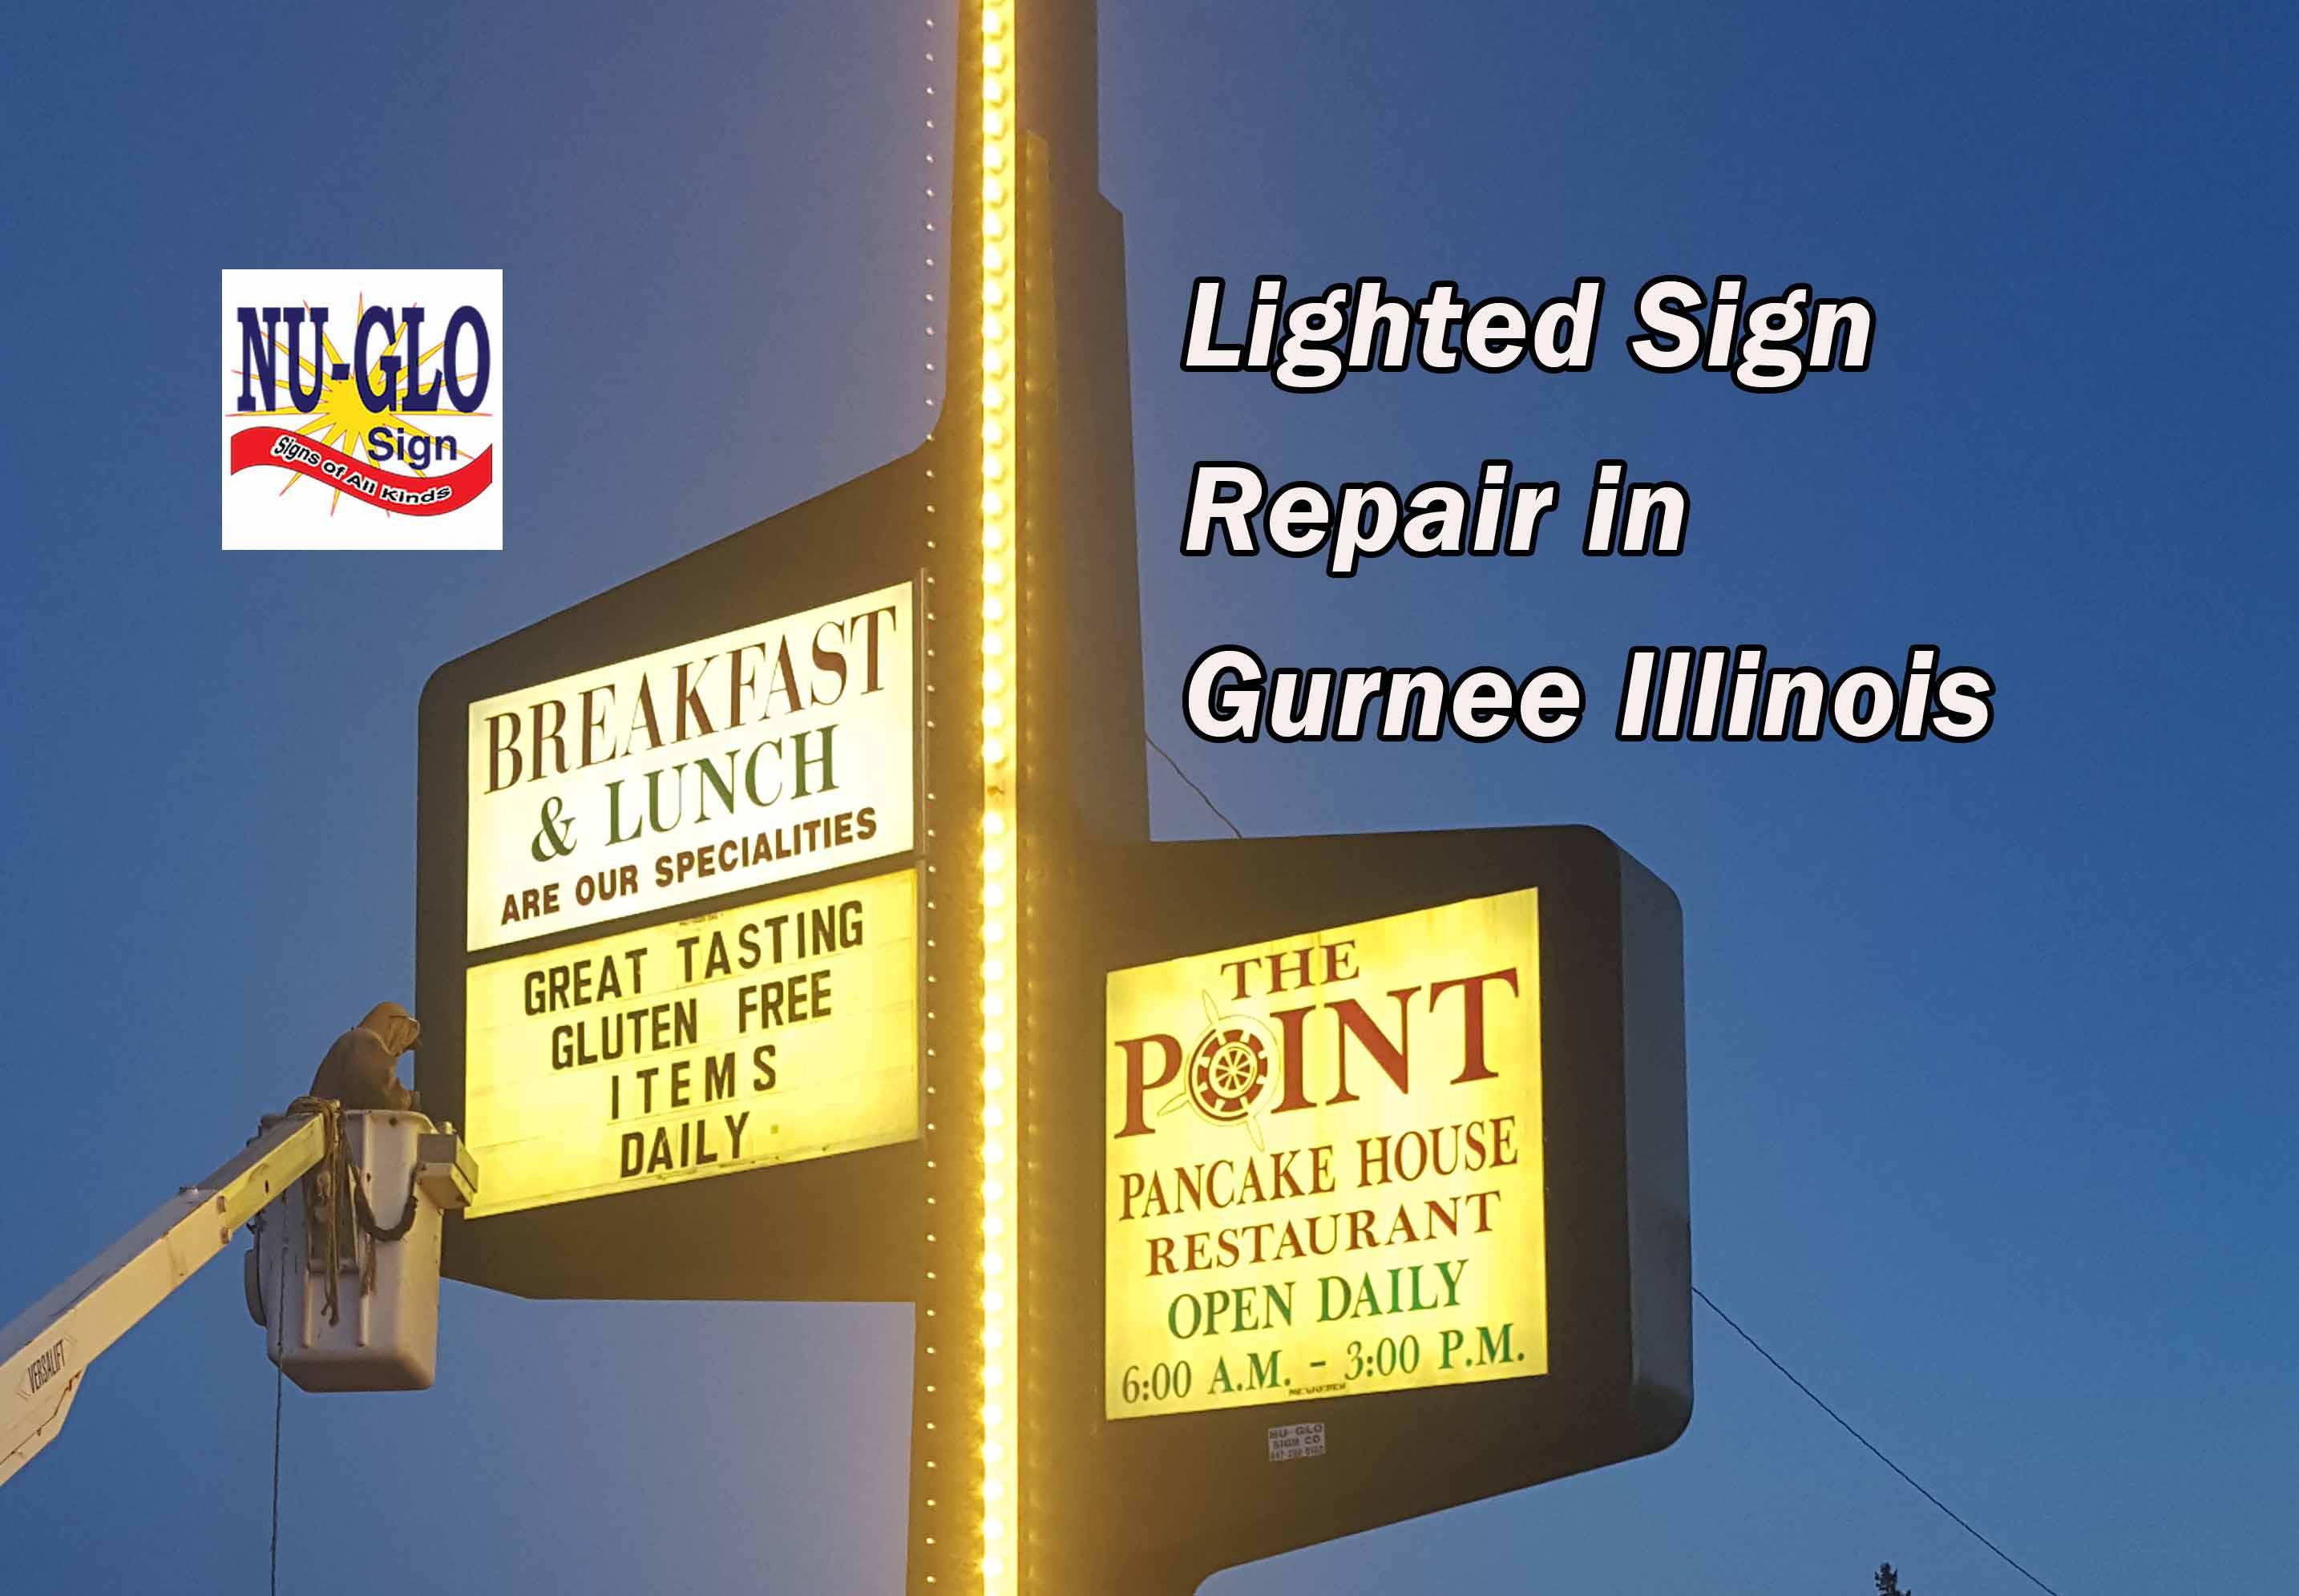 Lighted Sign Repair in Gurnee